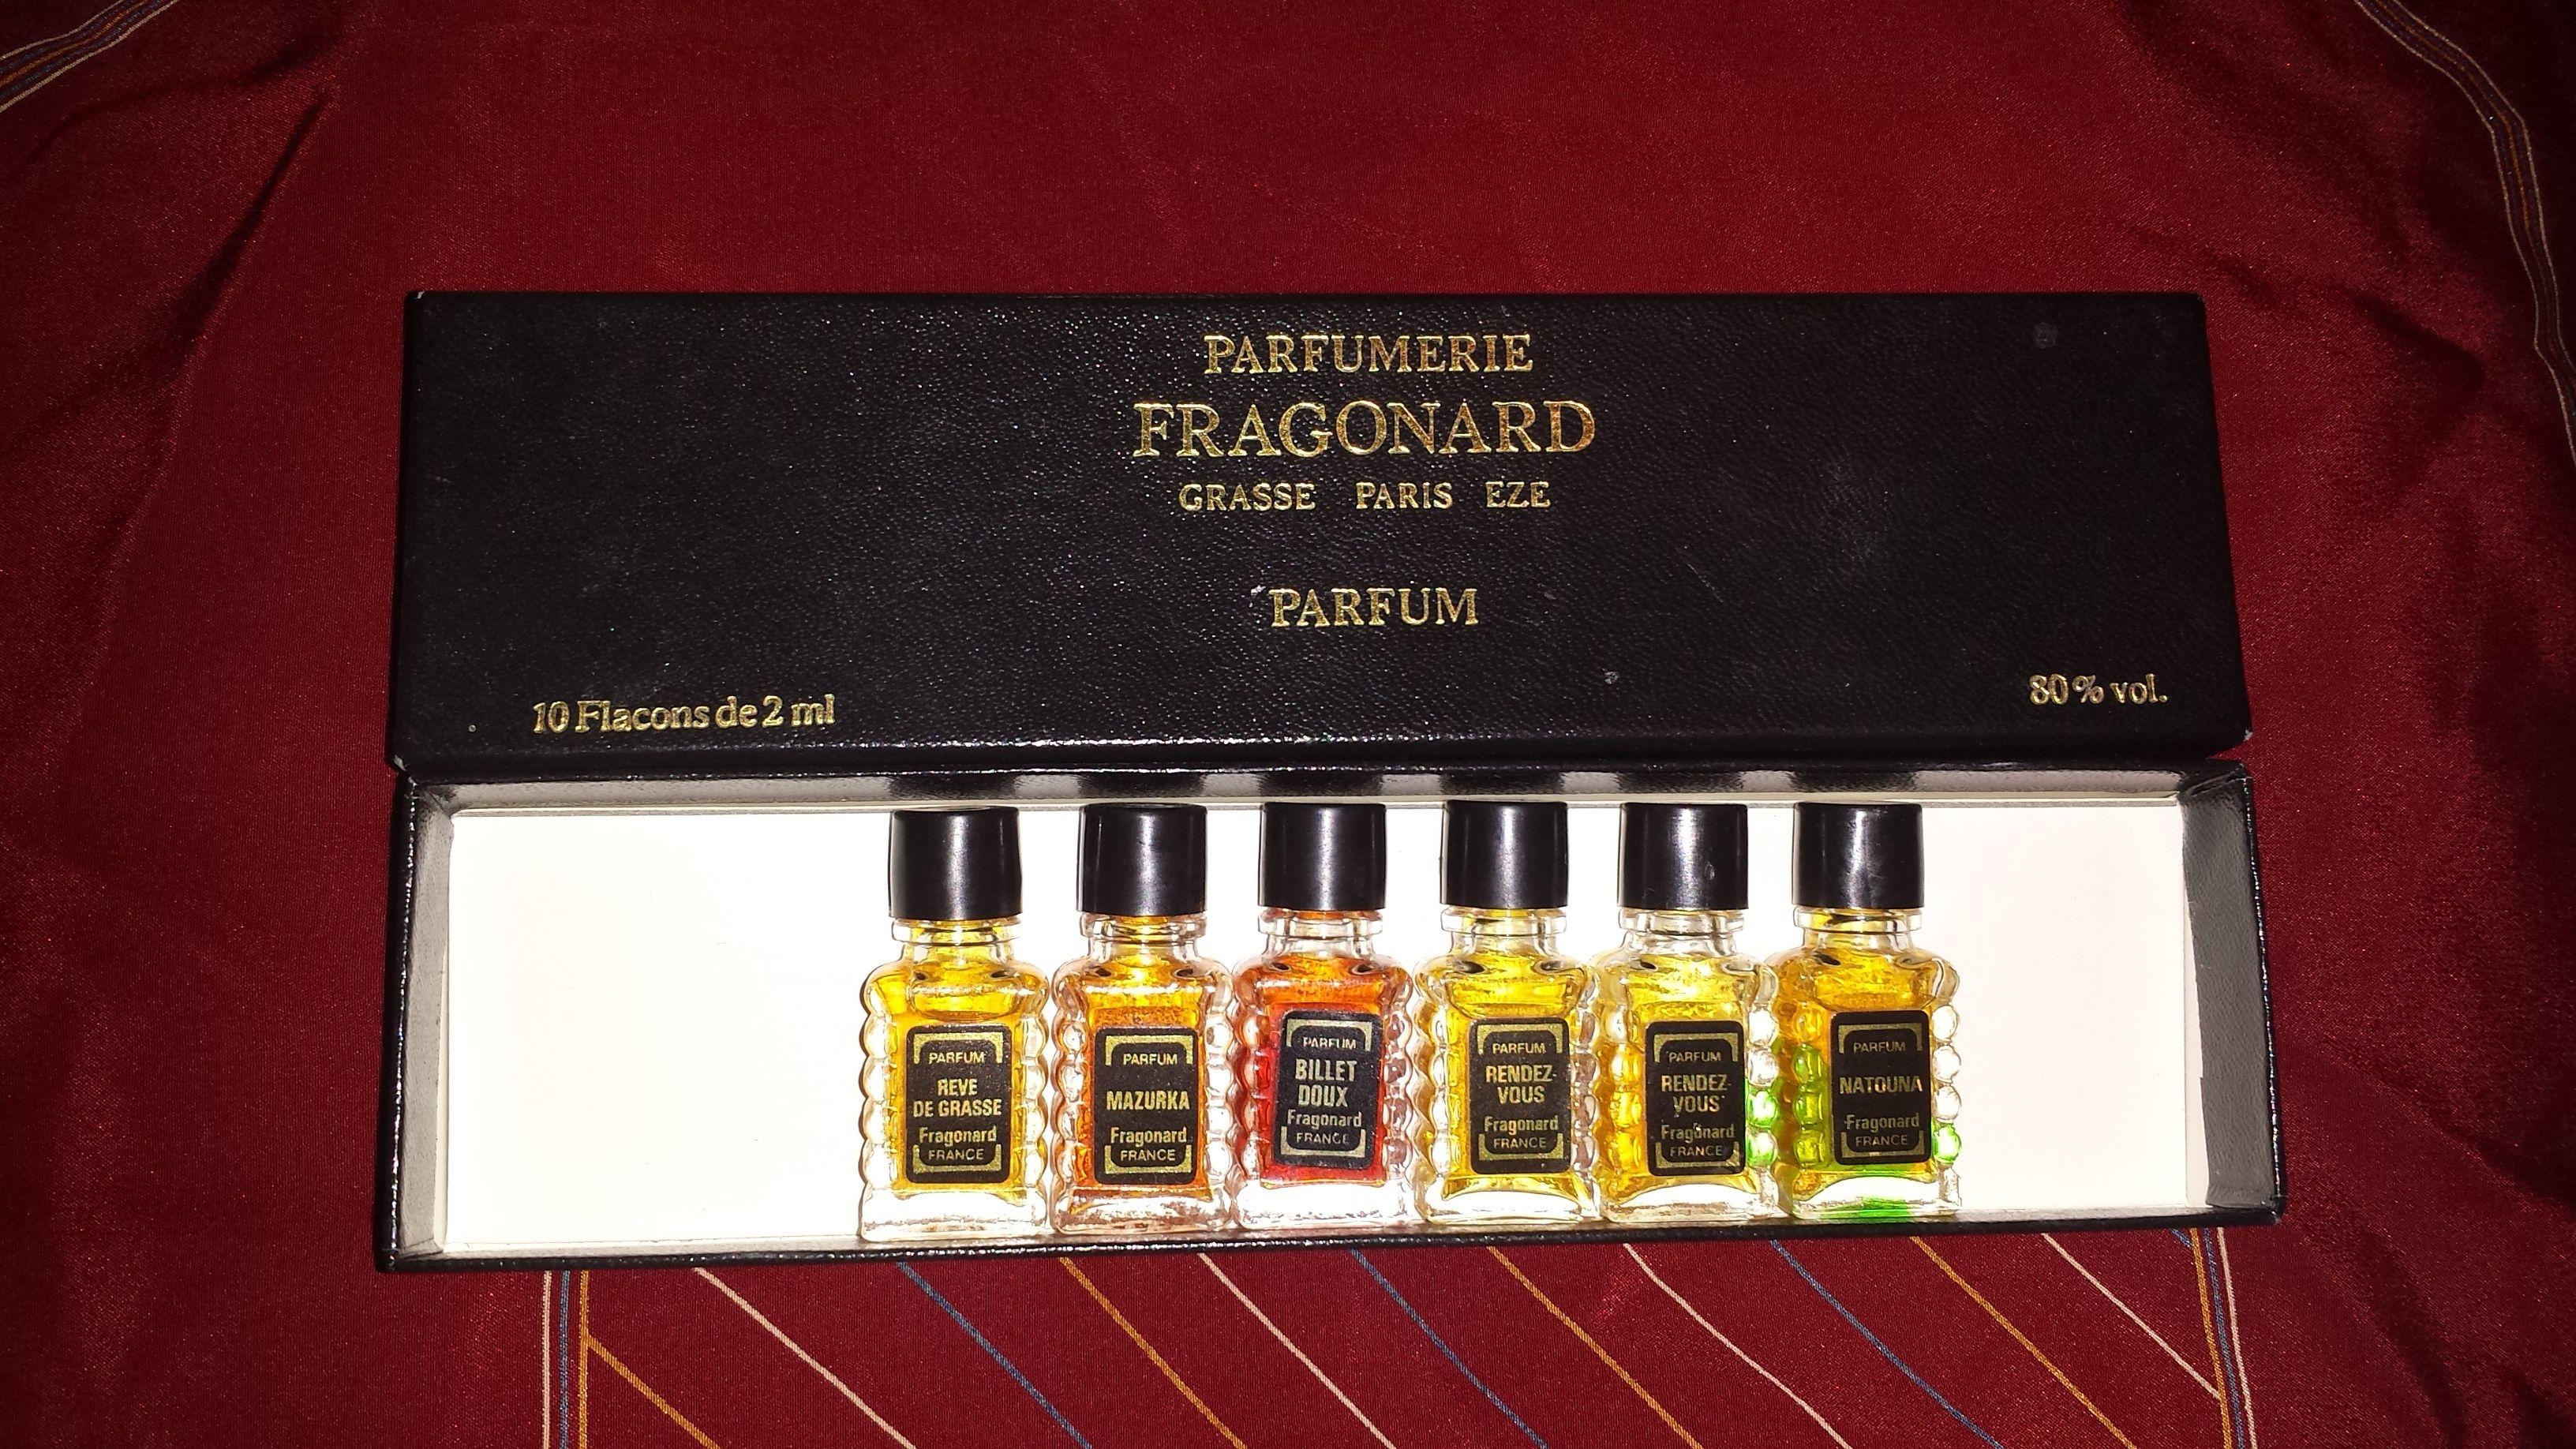 Parfumerie Fragonard Grasse Paris Eze Parfum Perfume Huntress